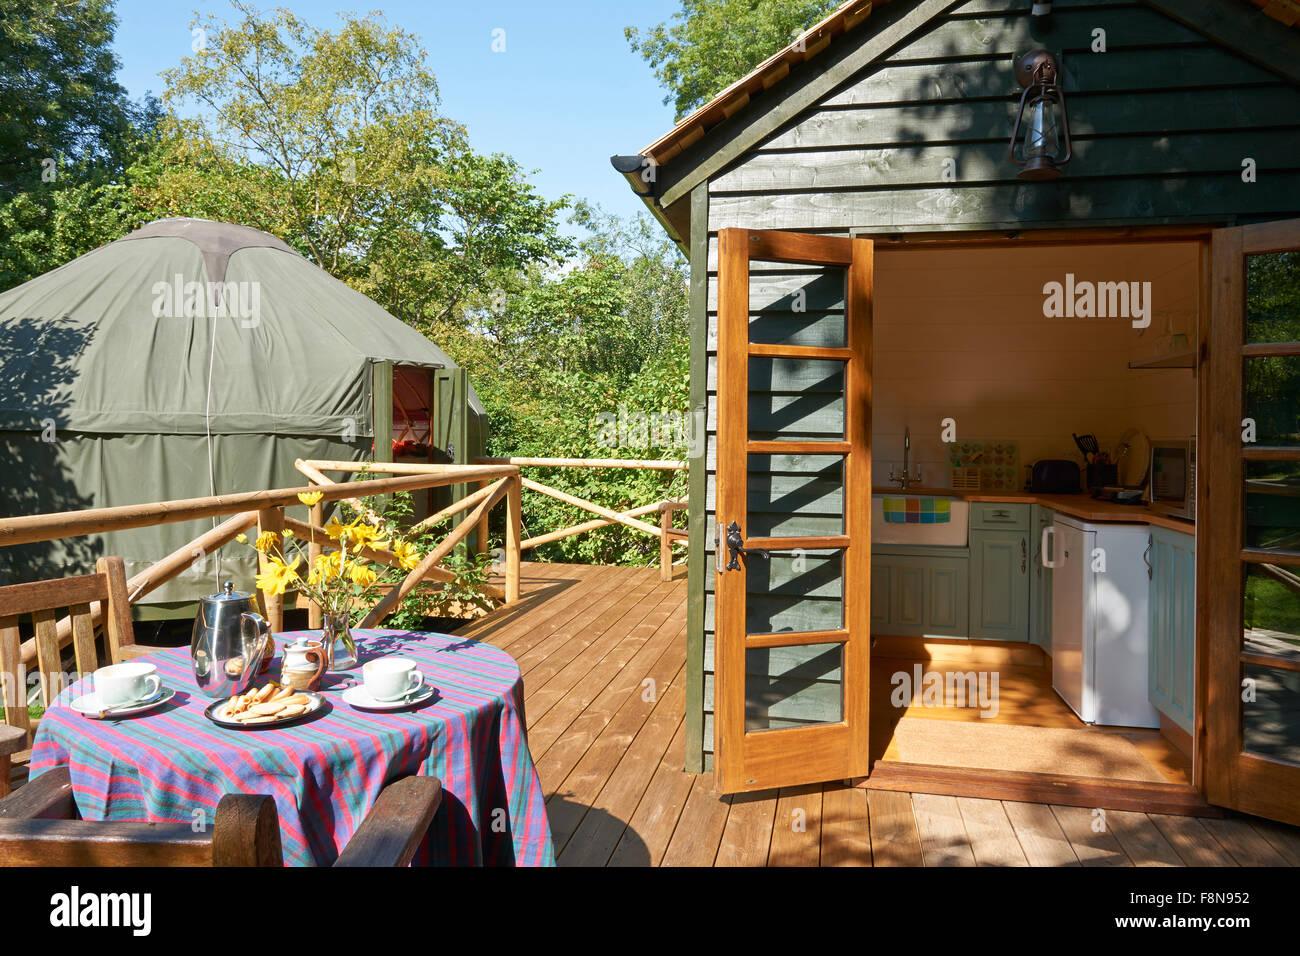 Exterior Of Beautiful Holiday Yurt - Stock Image